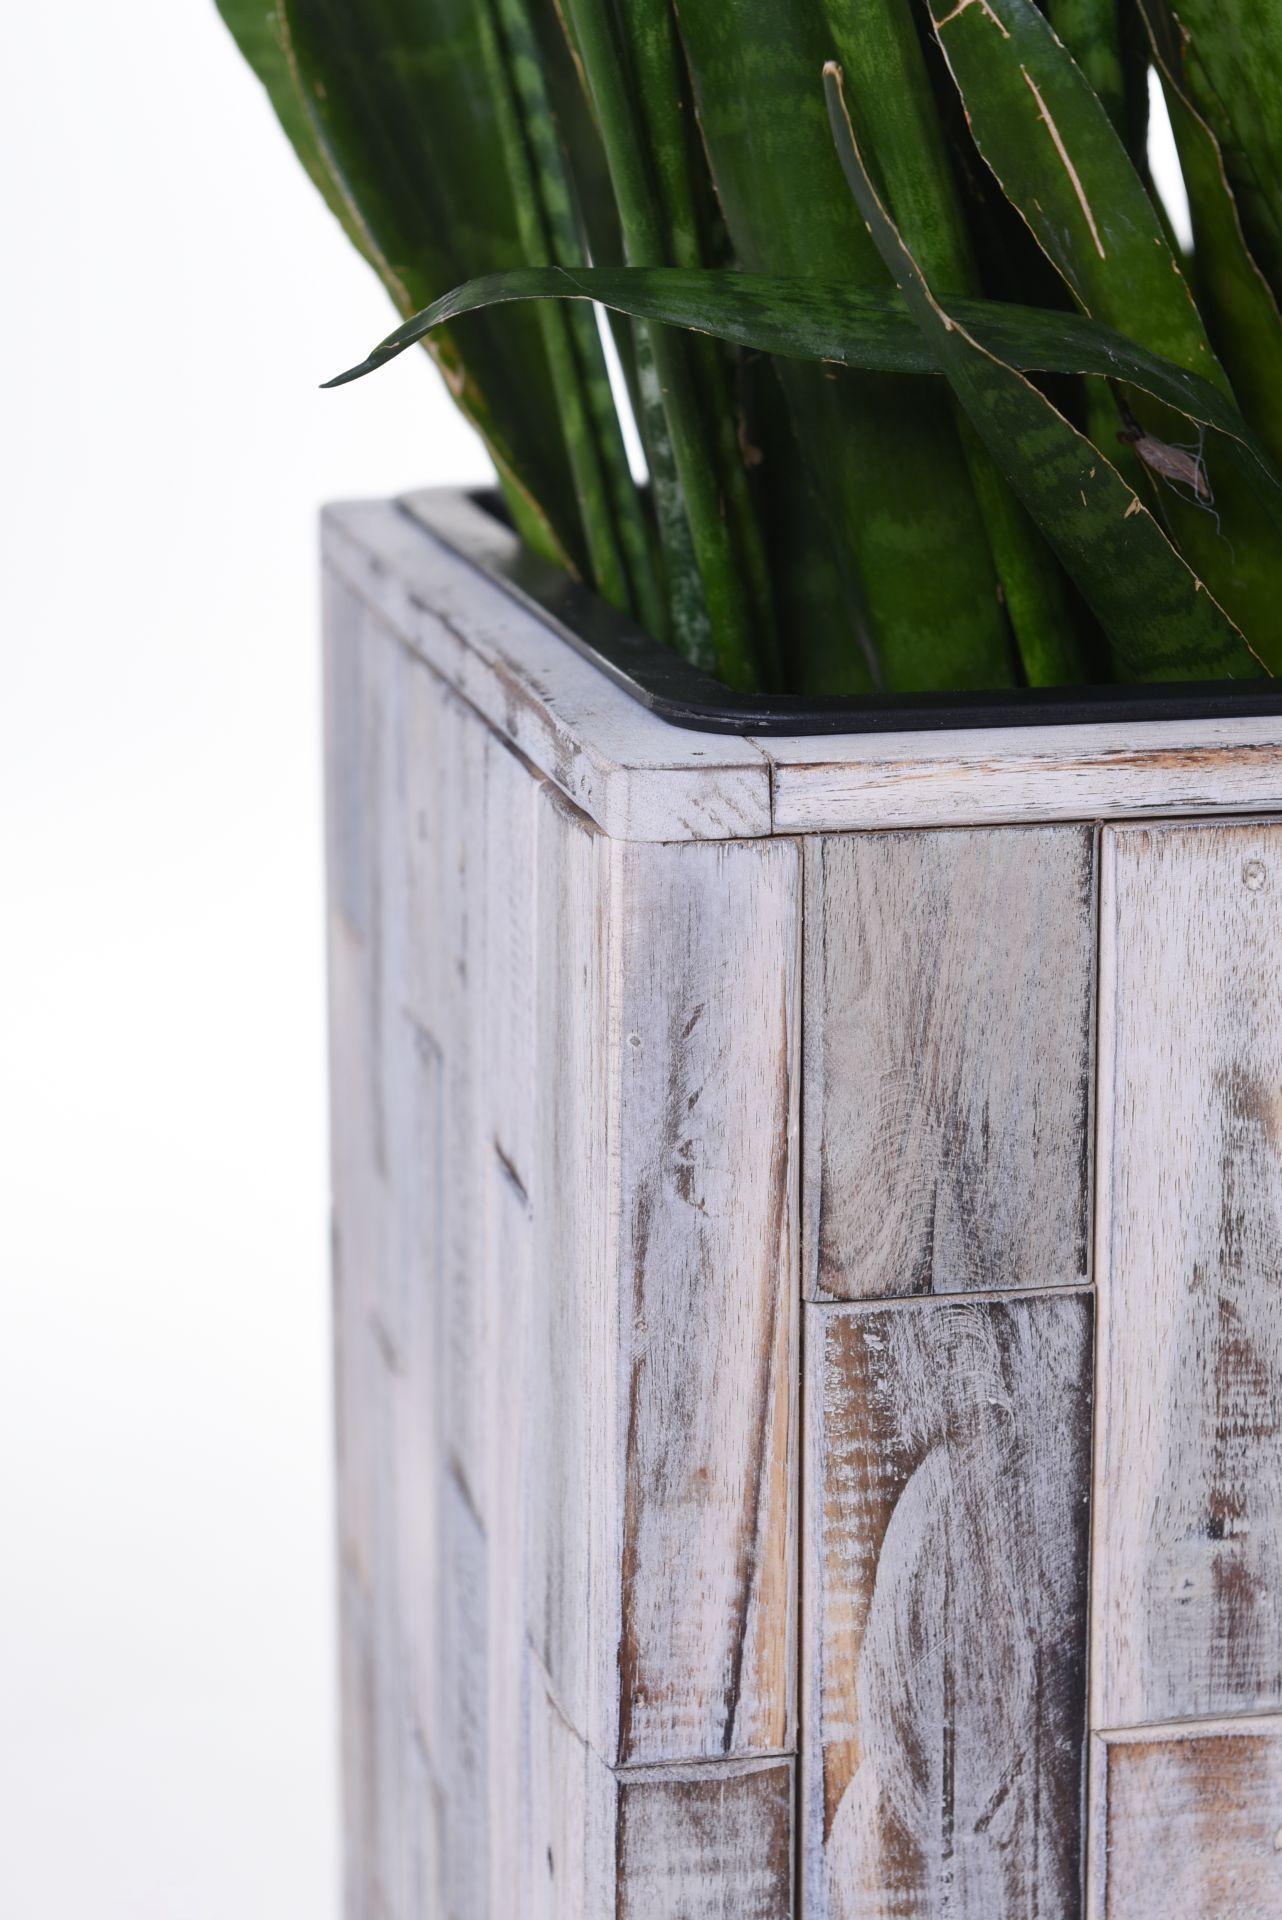 pflanzk bel blumenk bel pflanzs ule aus holz block shabby chic wei 74 cm hoch ebay. Black Bedroom Furniture Sets. Home Design Ideas